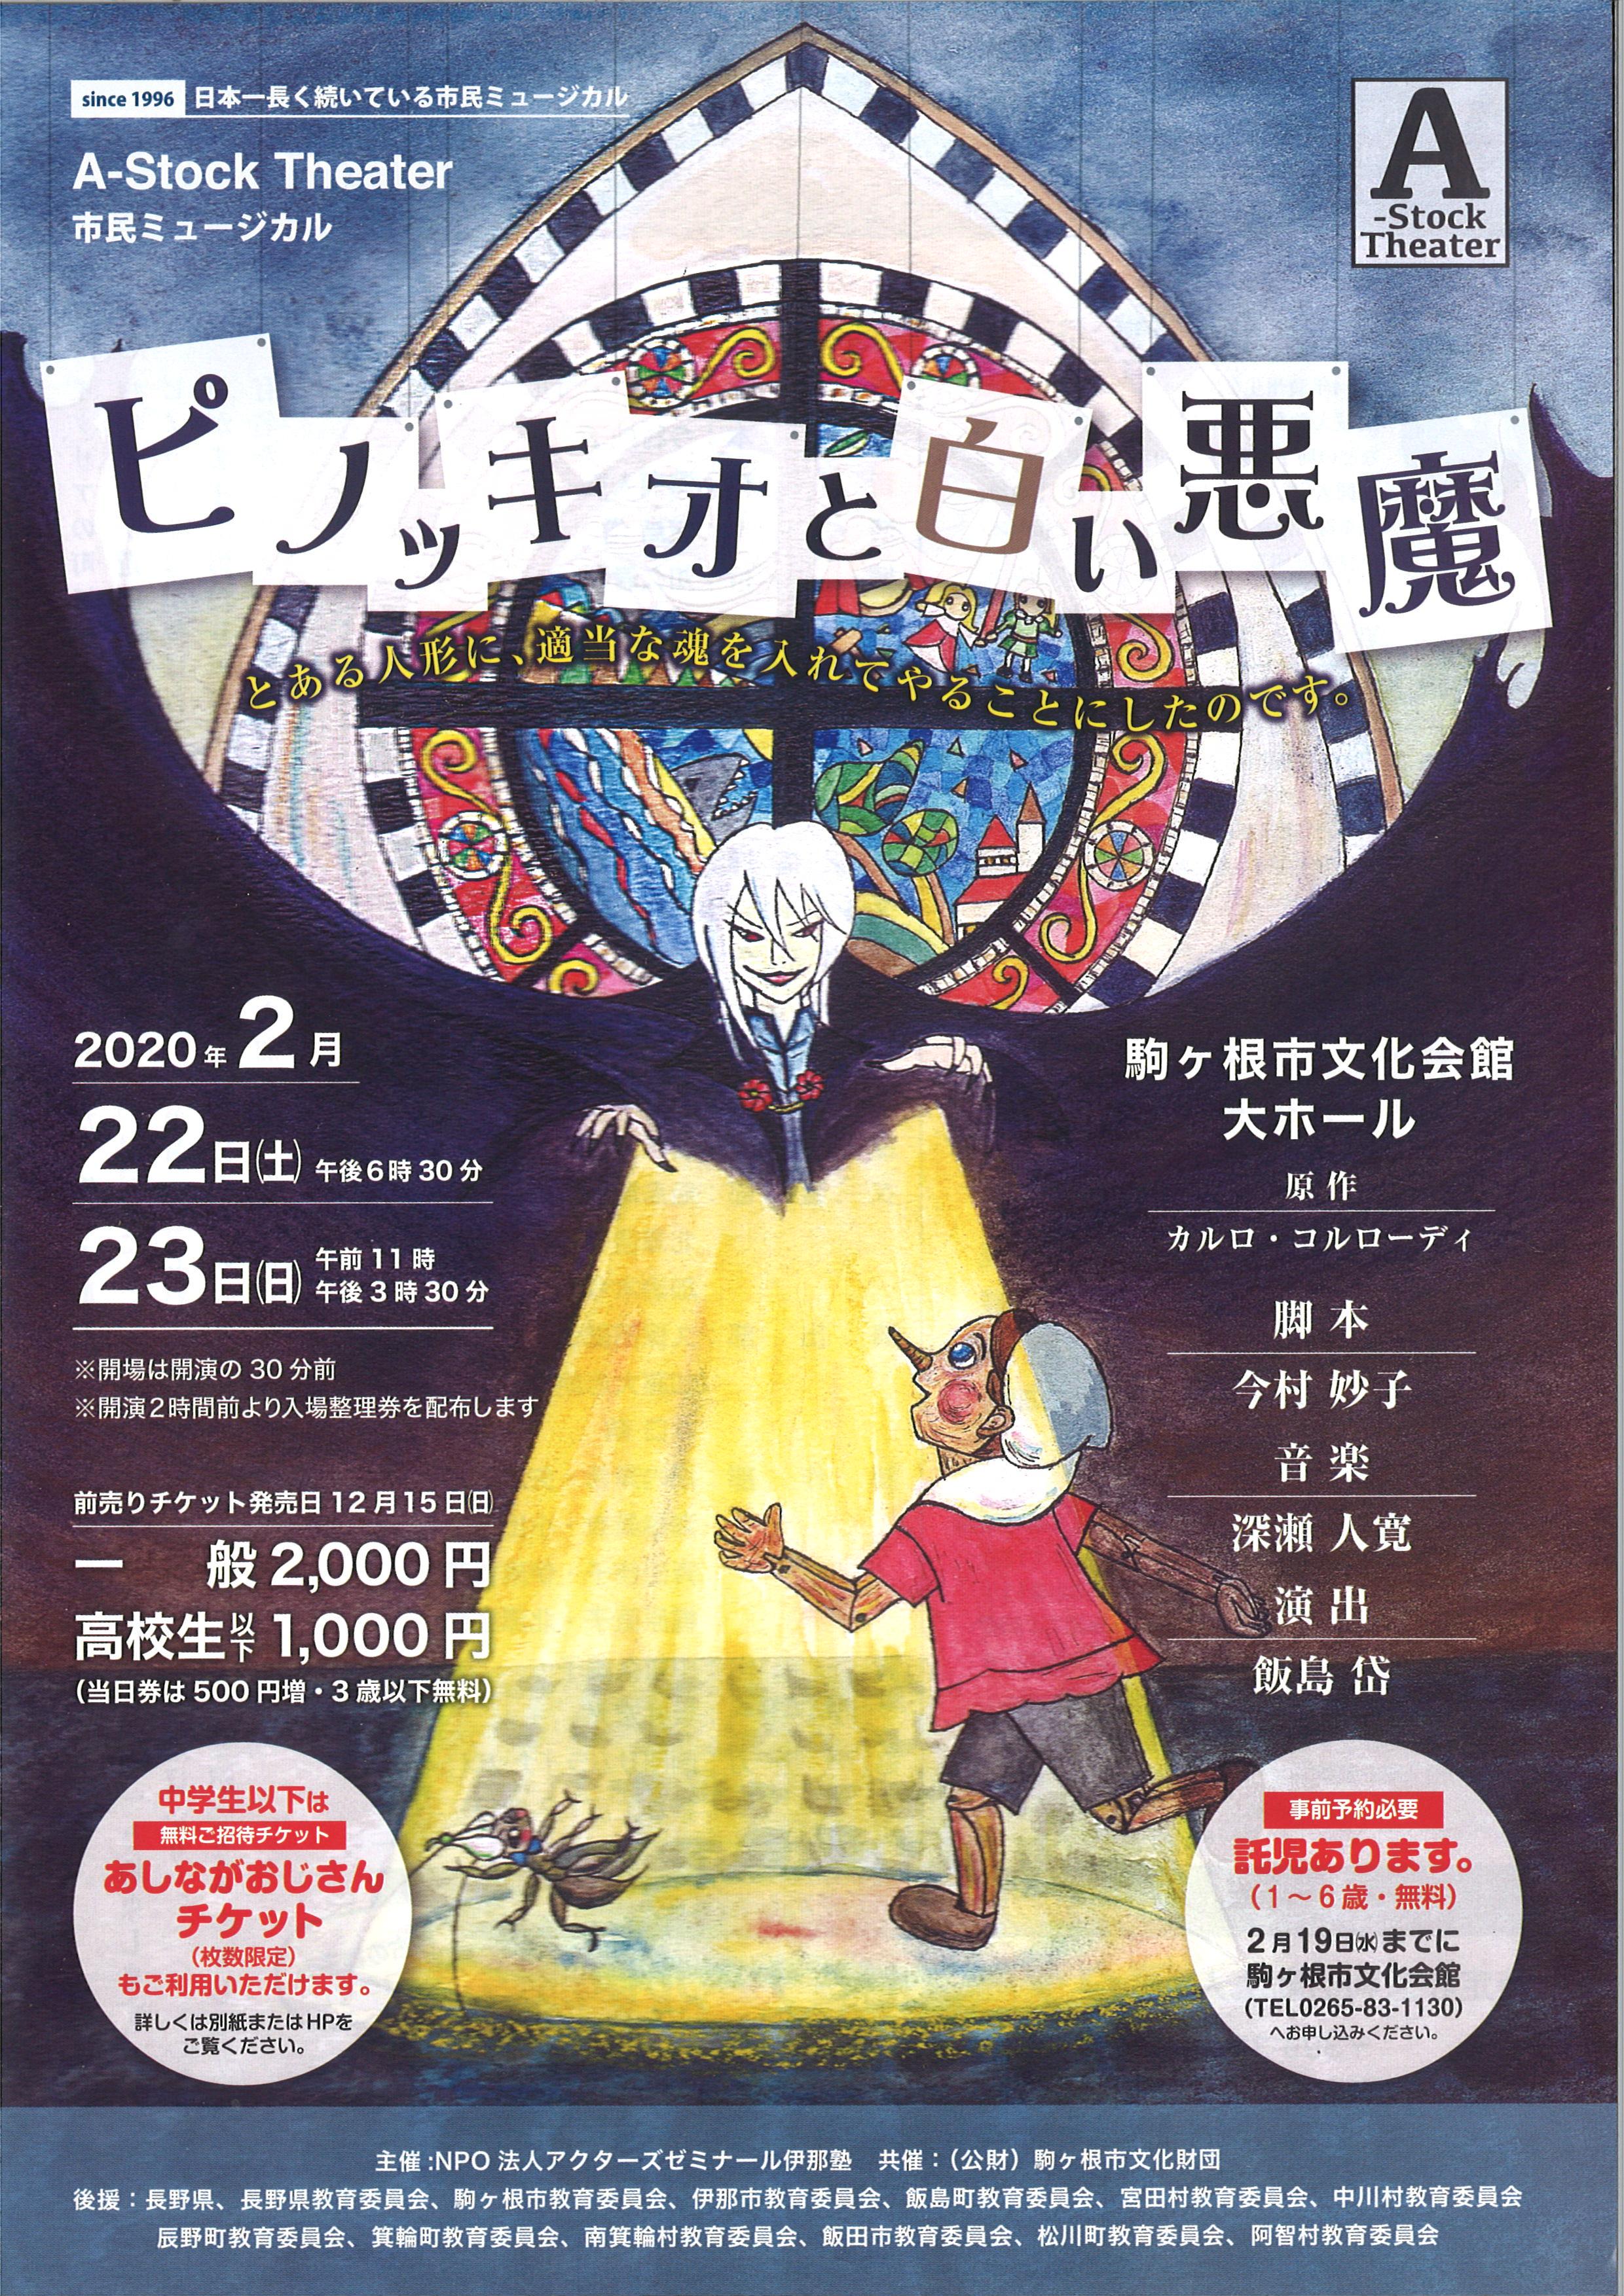 A-Stock Theater 「ピノッキオと白い悪魔」